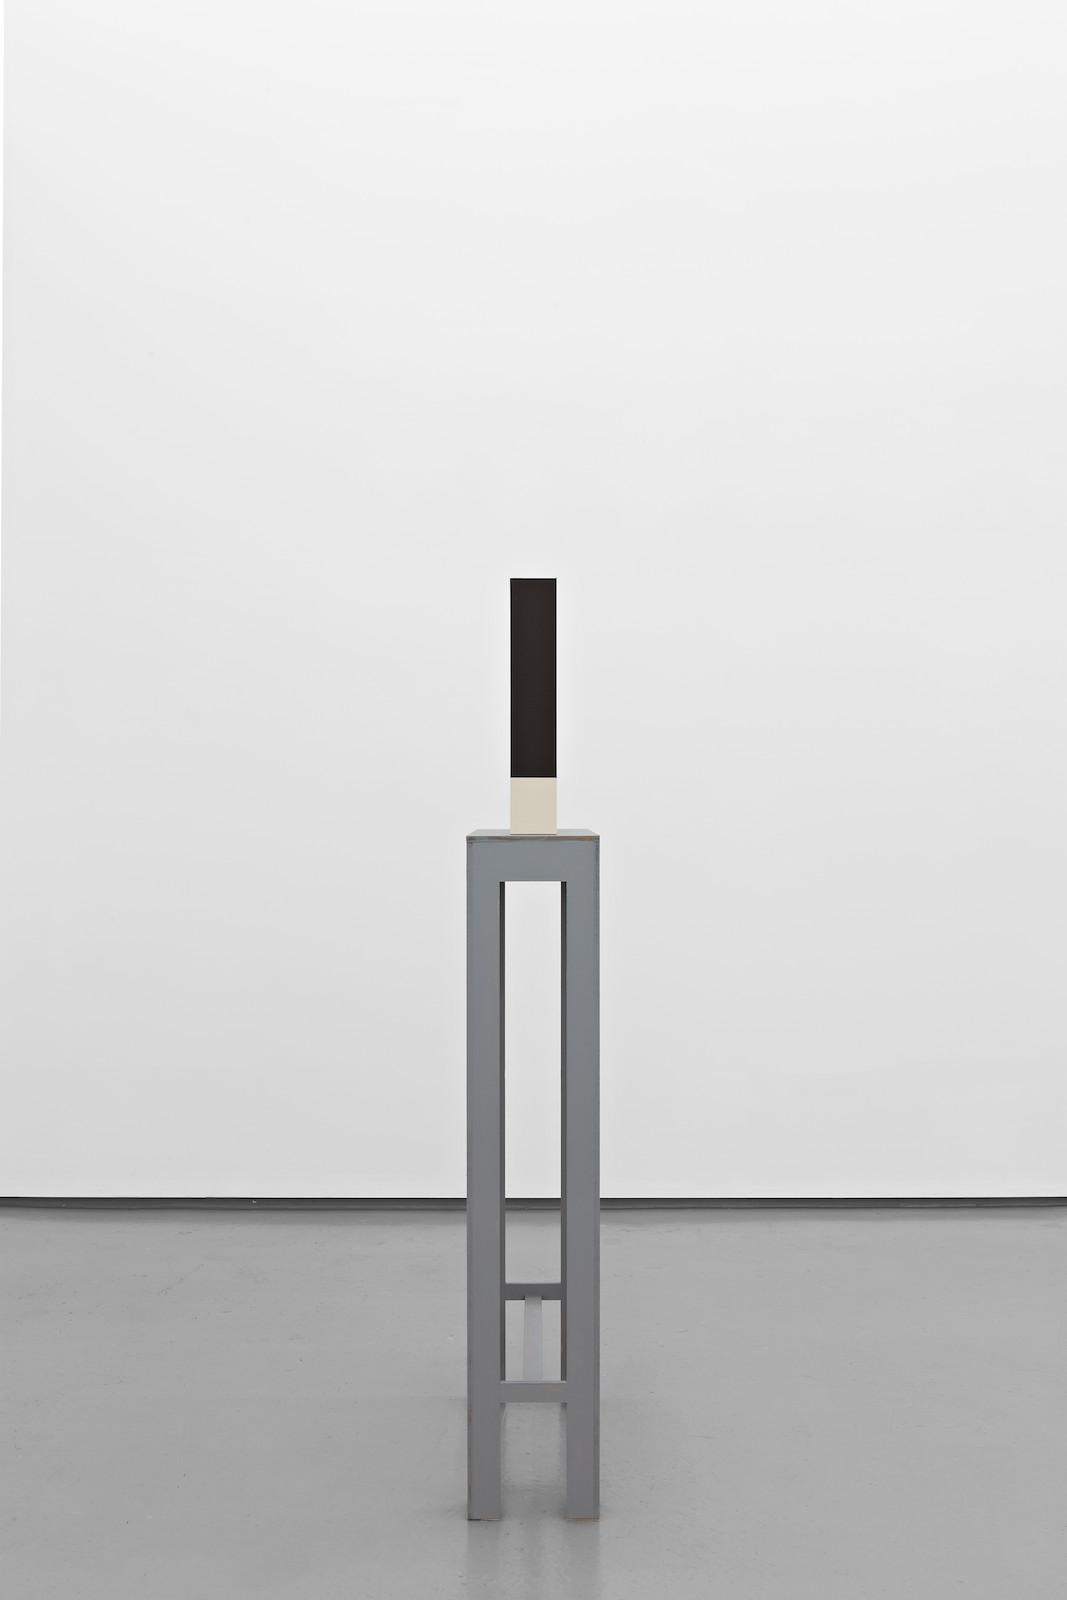 Chosement II, 2014, acrylic on MDF, 39,5 x 43 x 7,2 cm